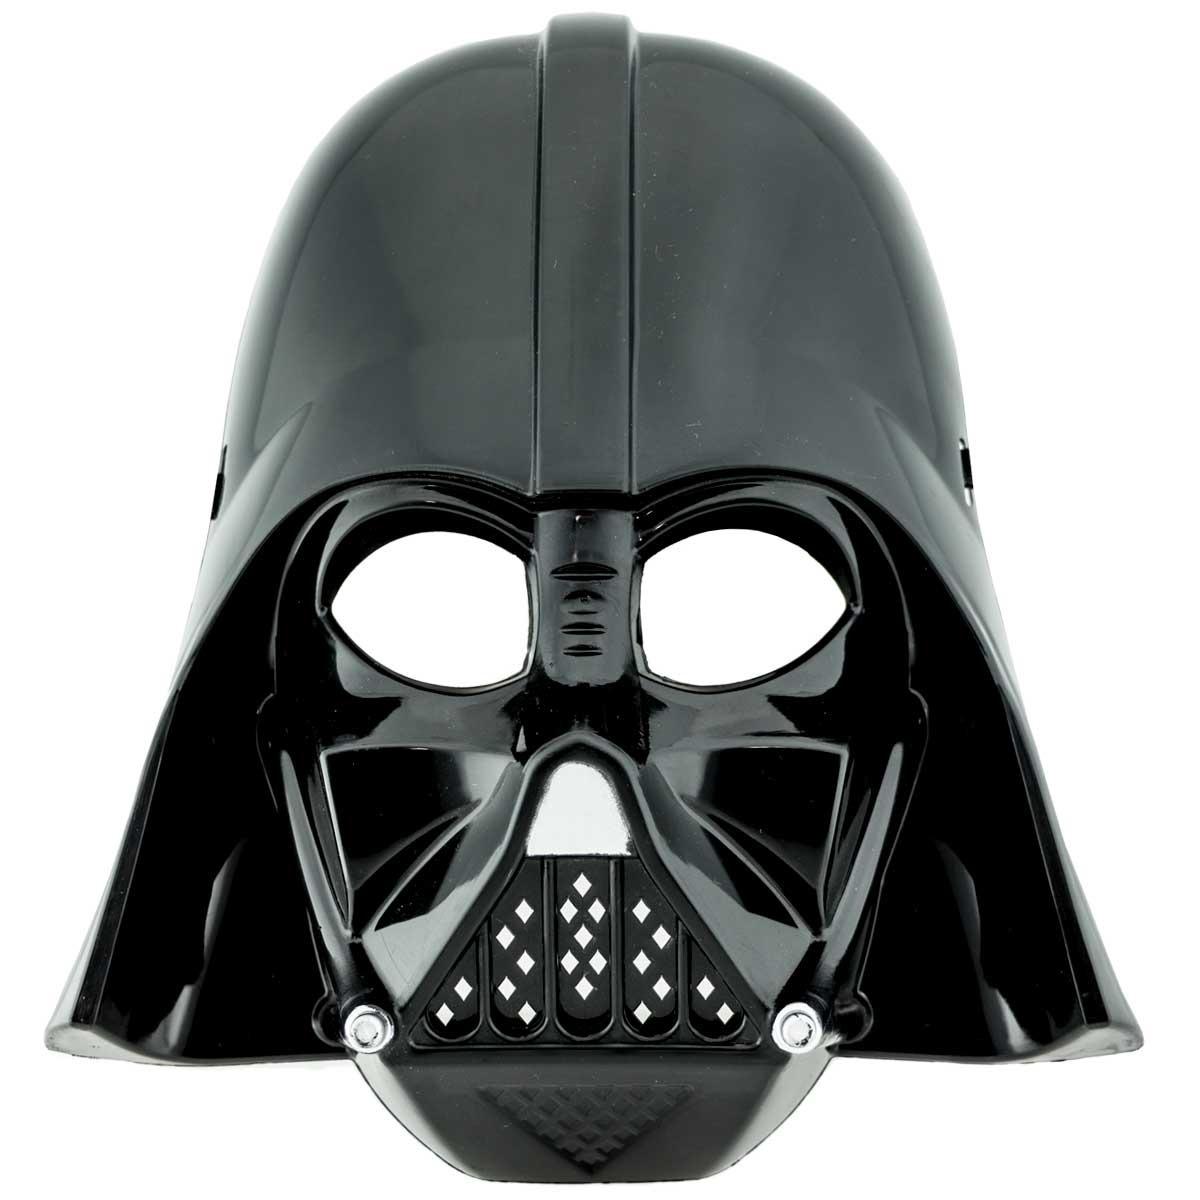 Fantasia Star Wars Kit C Capa E Mascara Darth Vader Original R